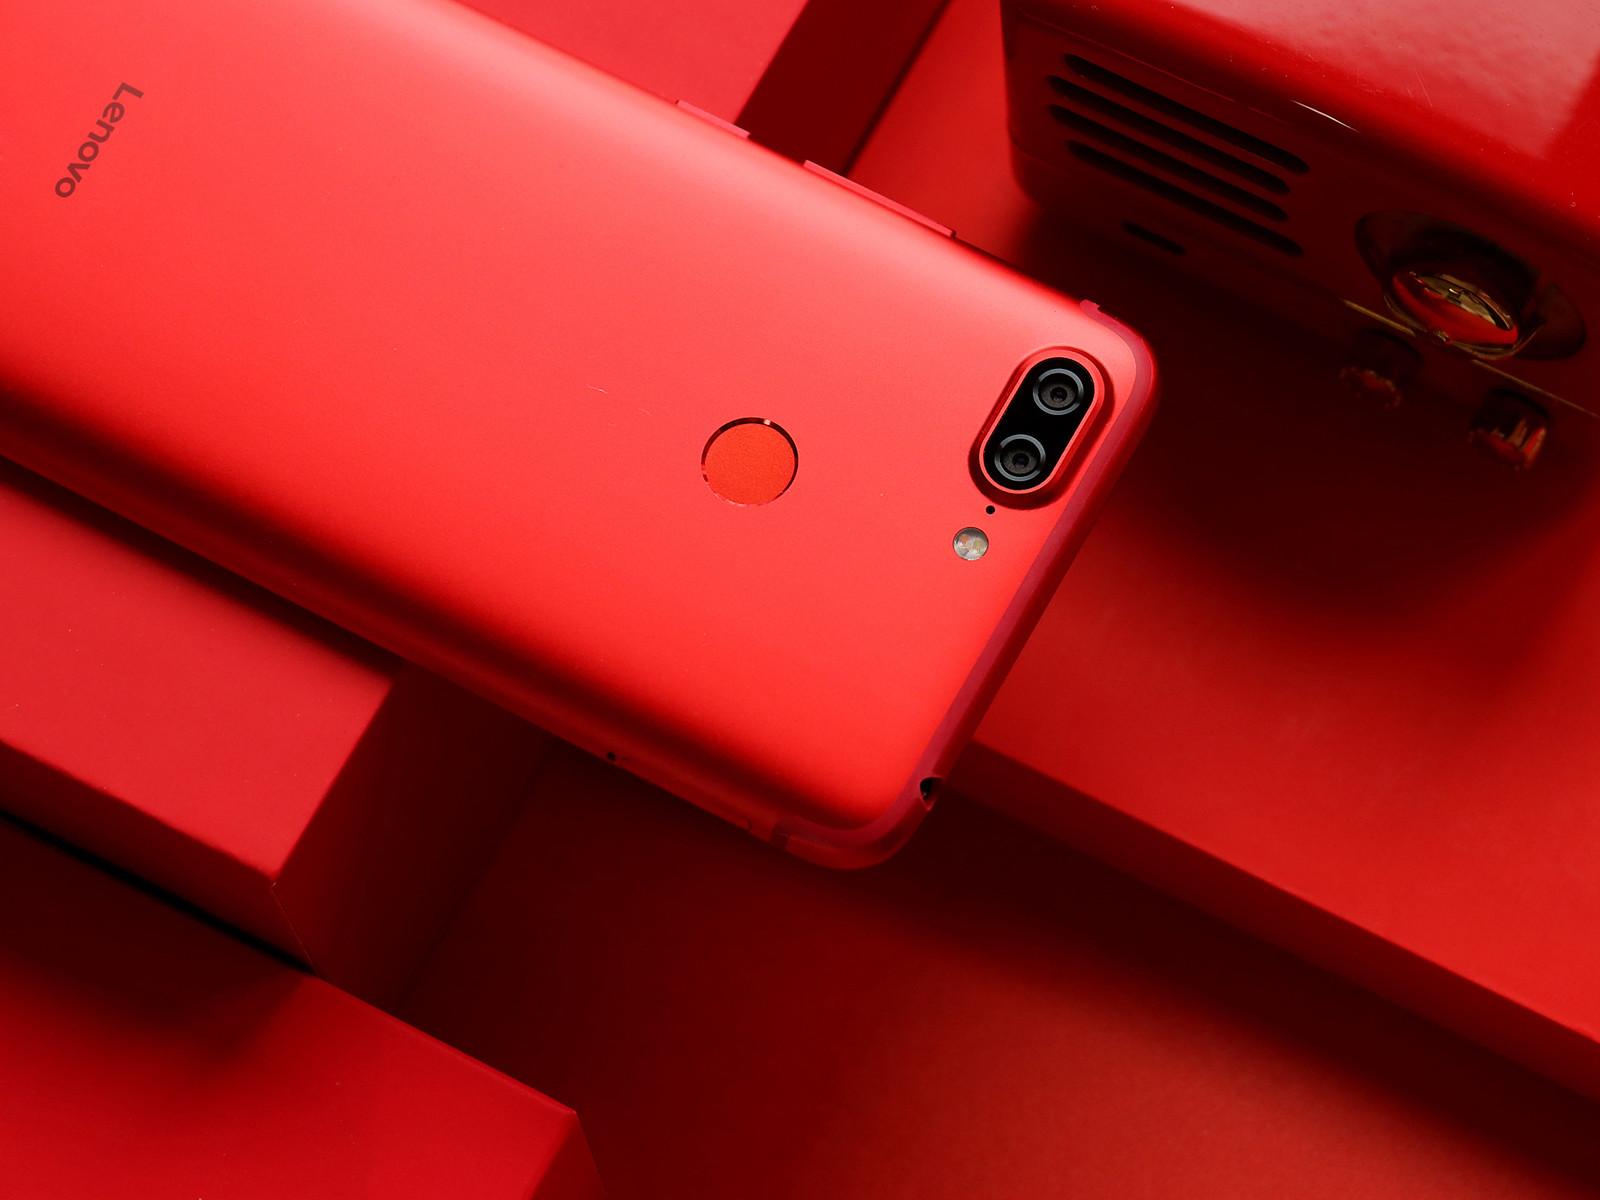 LenovoS5(4+64GB)机身细节第5张